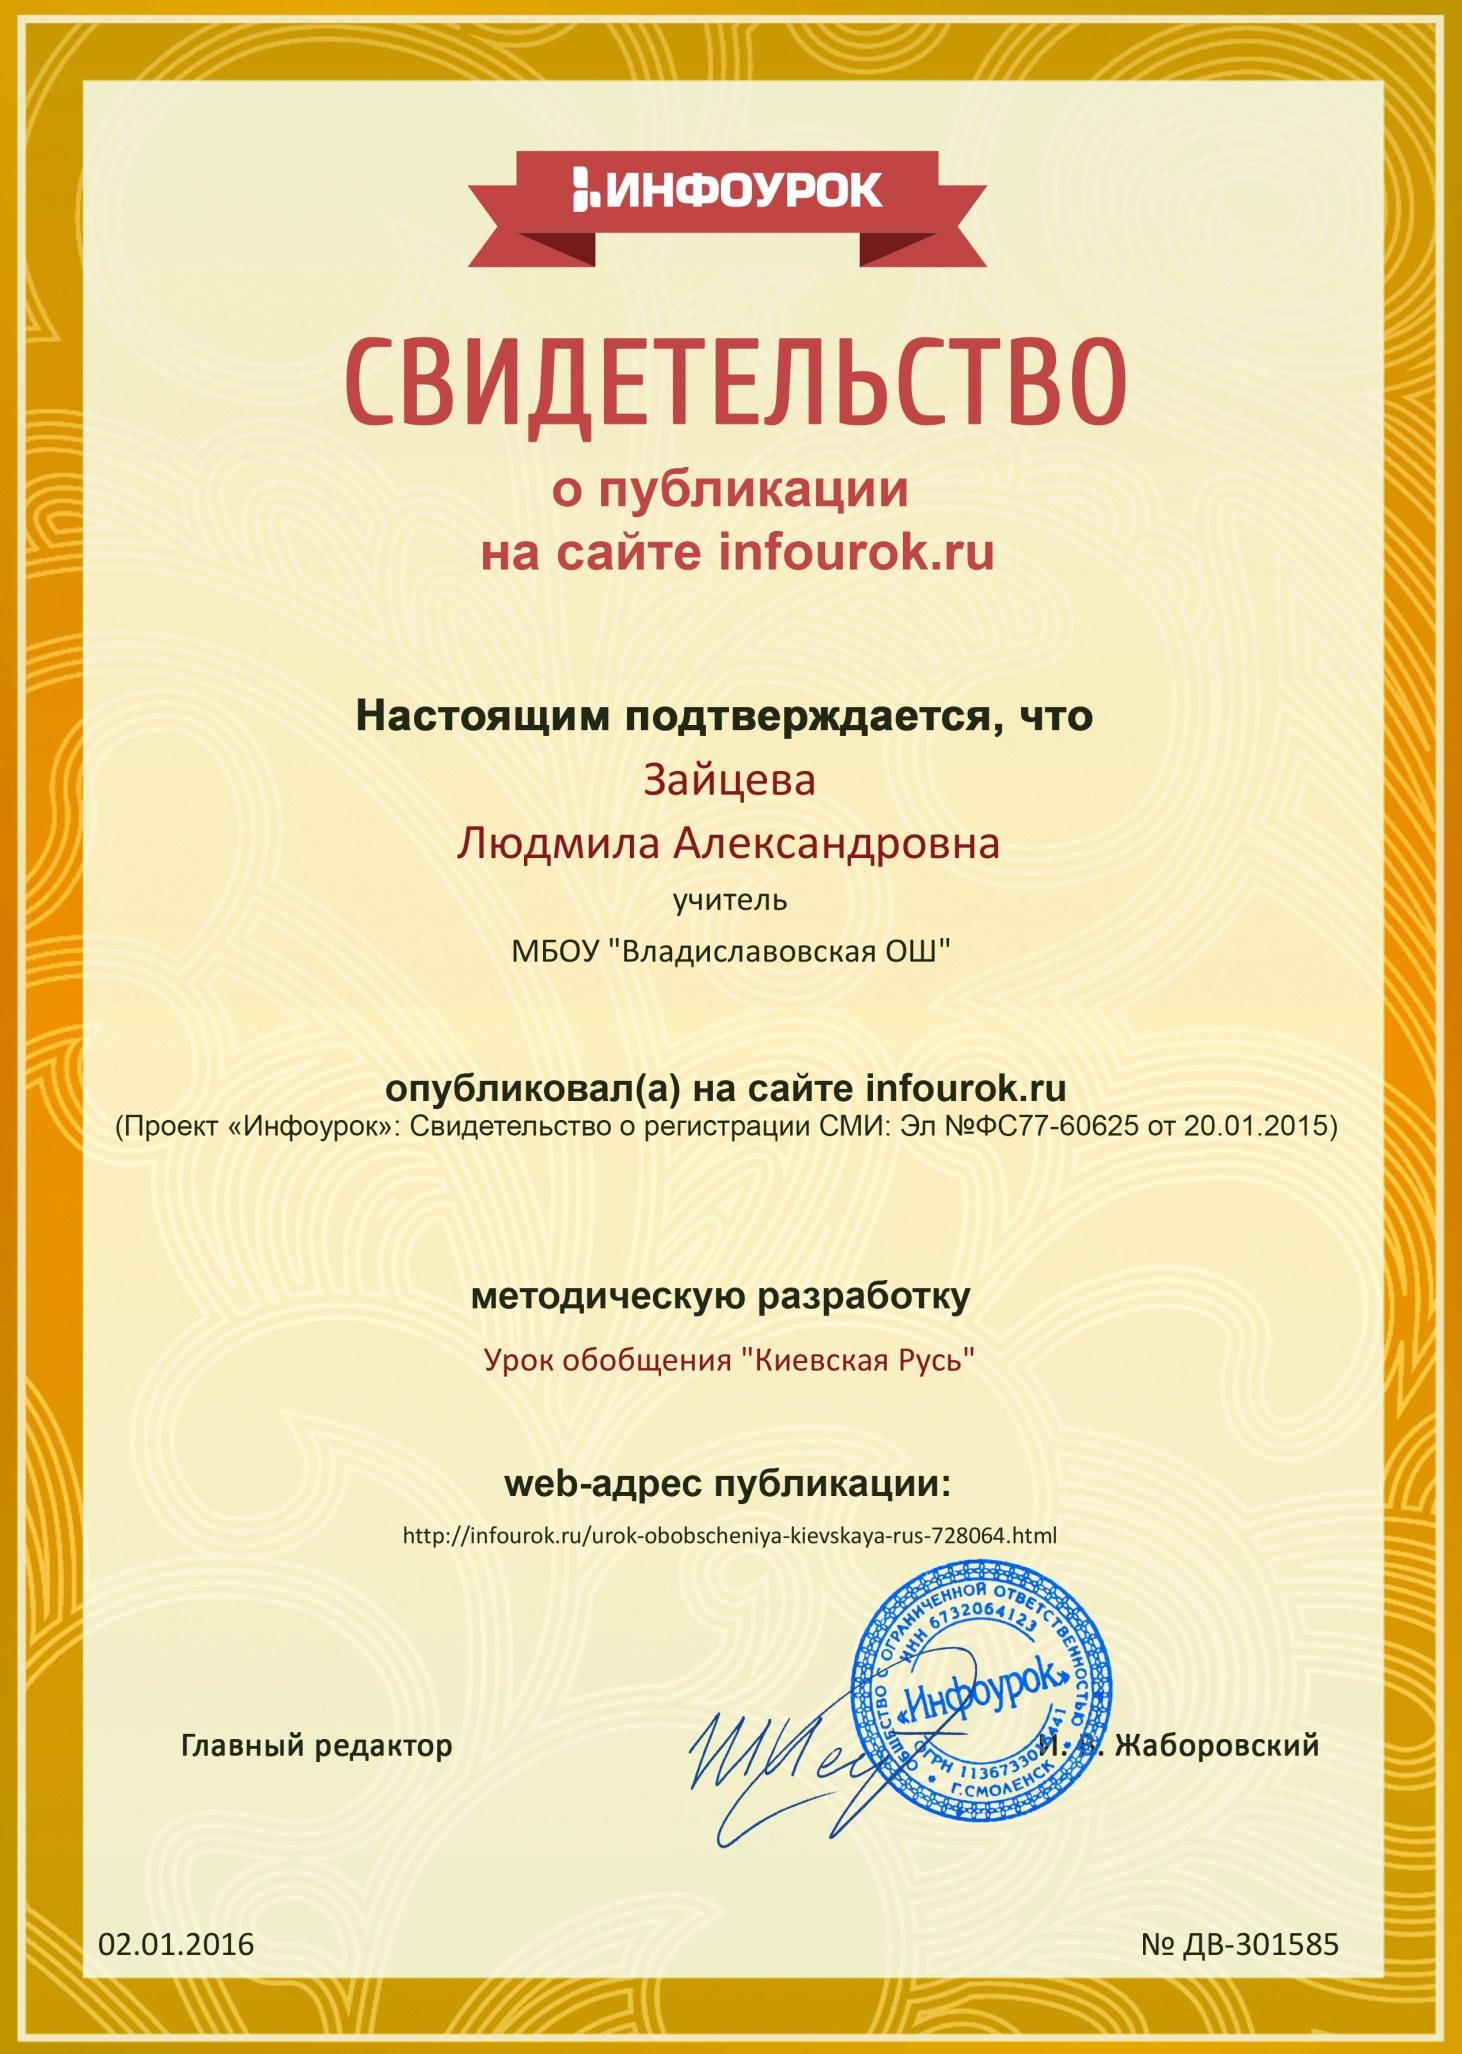 D:\школа\аттестация\Сертификат проекта infourok.ru № ДВ-301585 (1).jpg